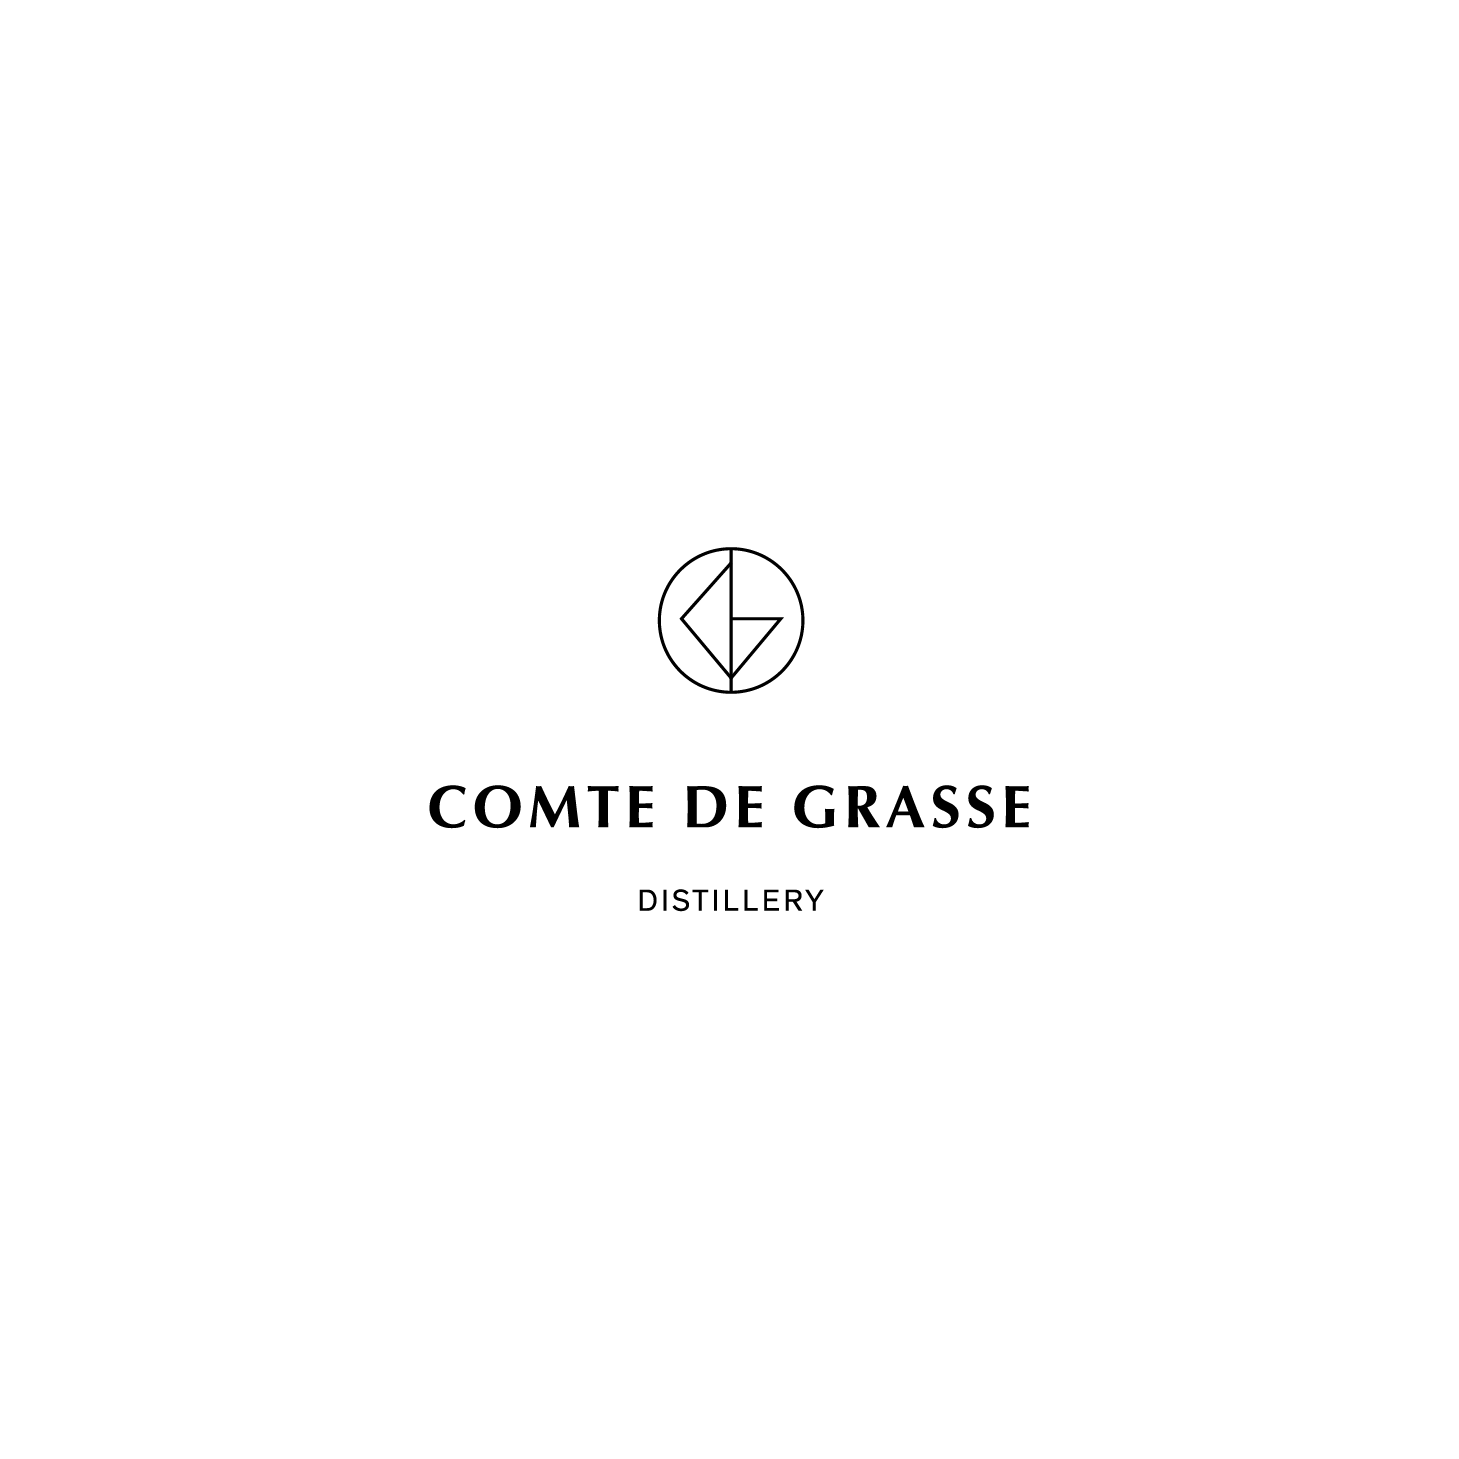 COMTE DE GRASSE-01.png